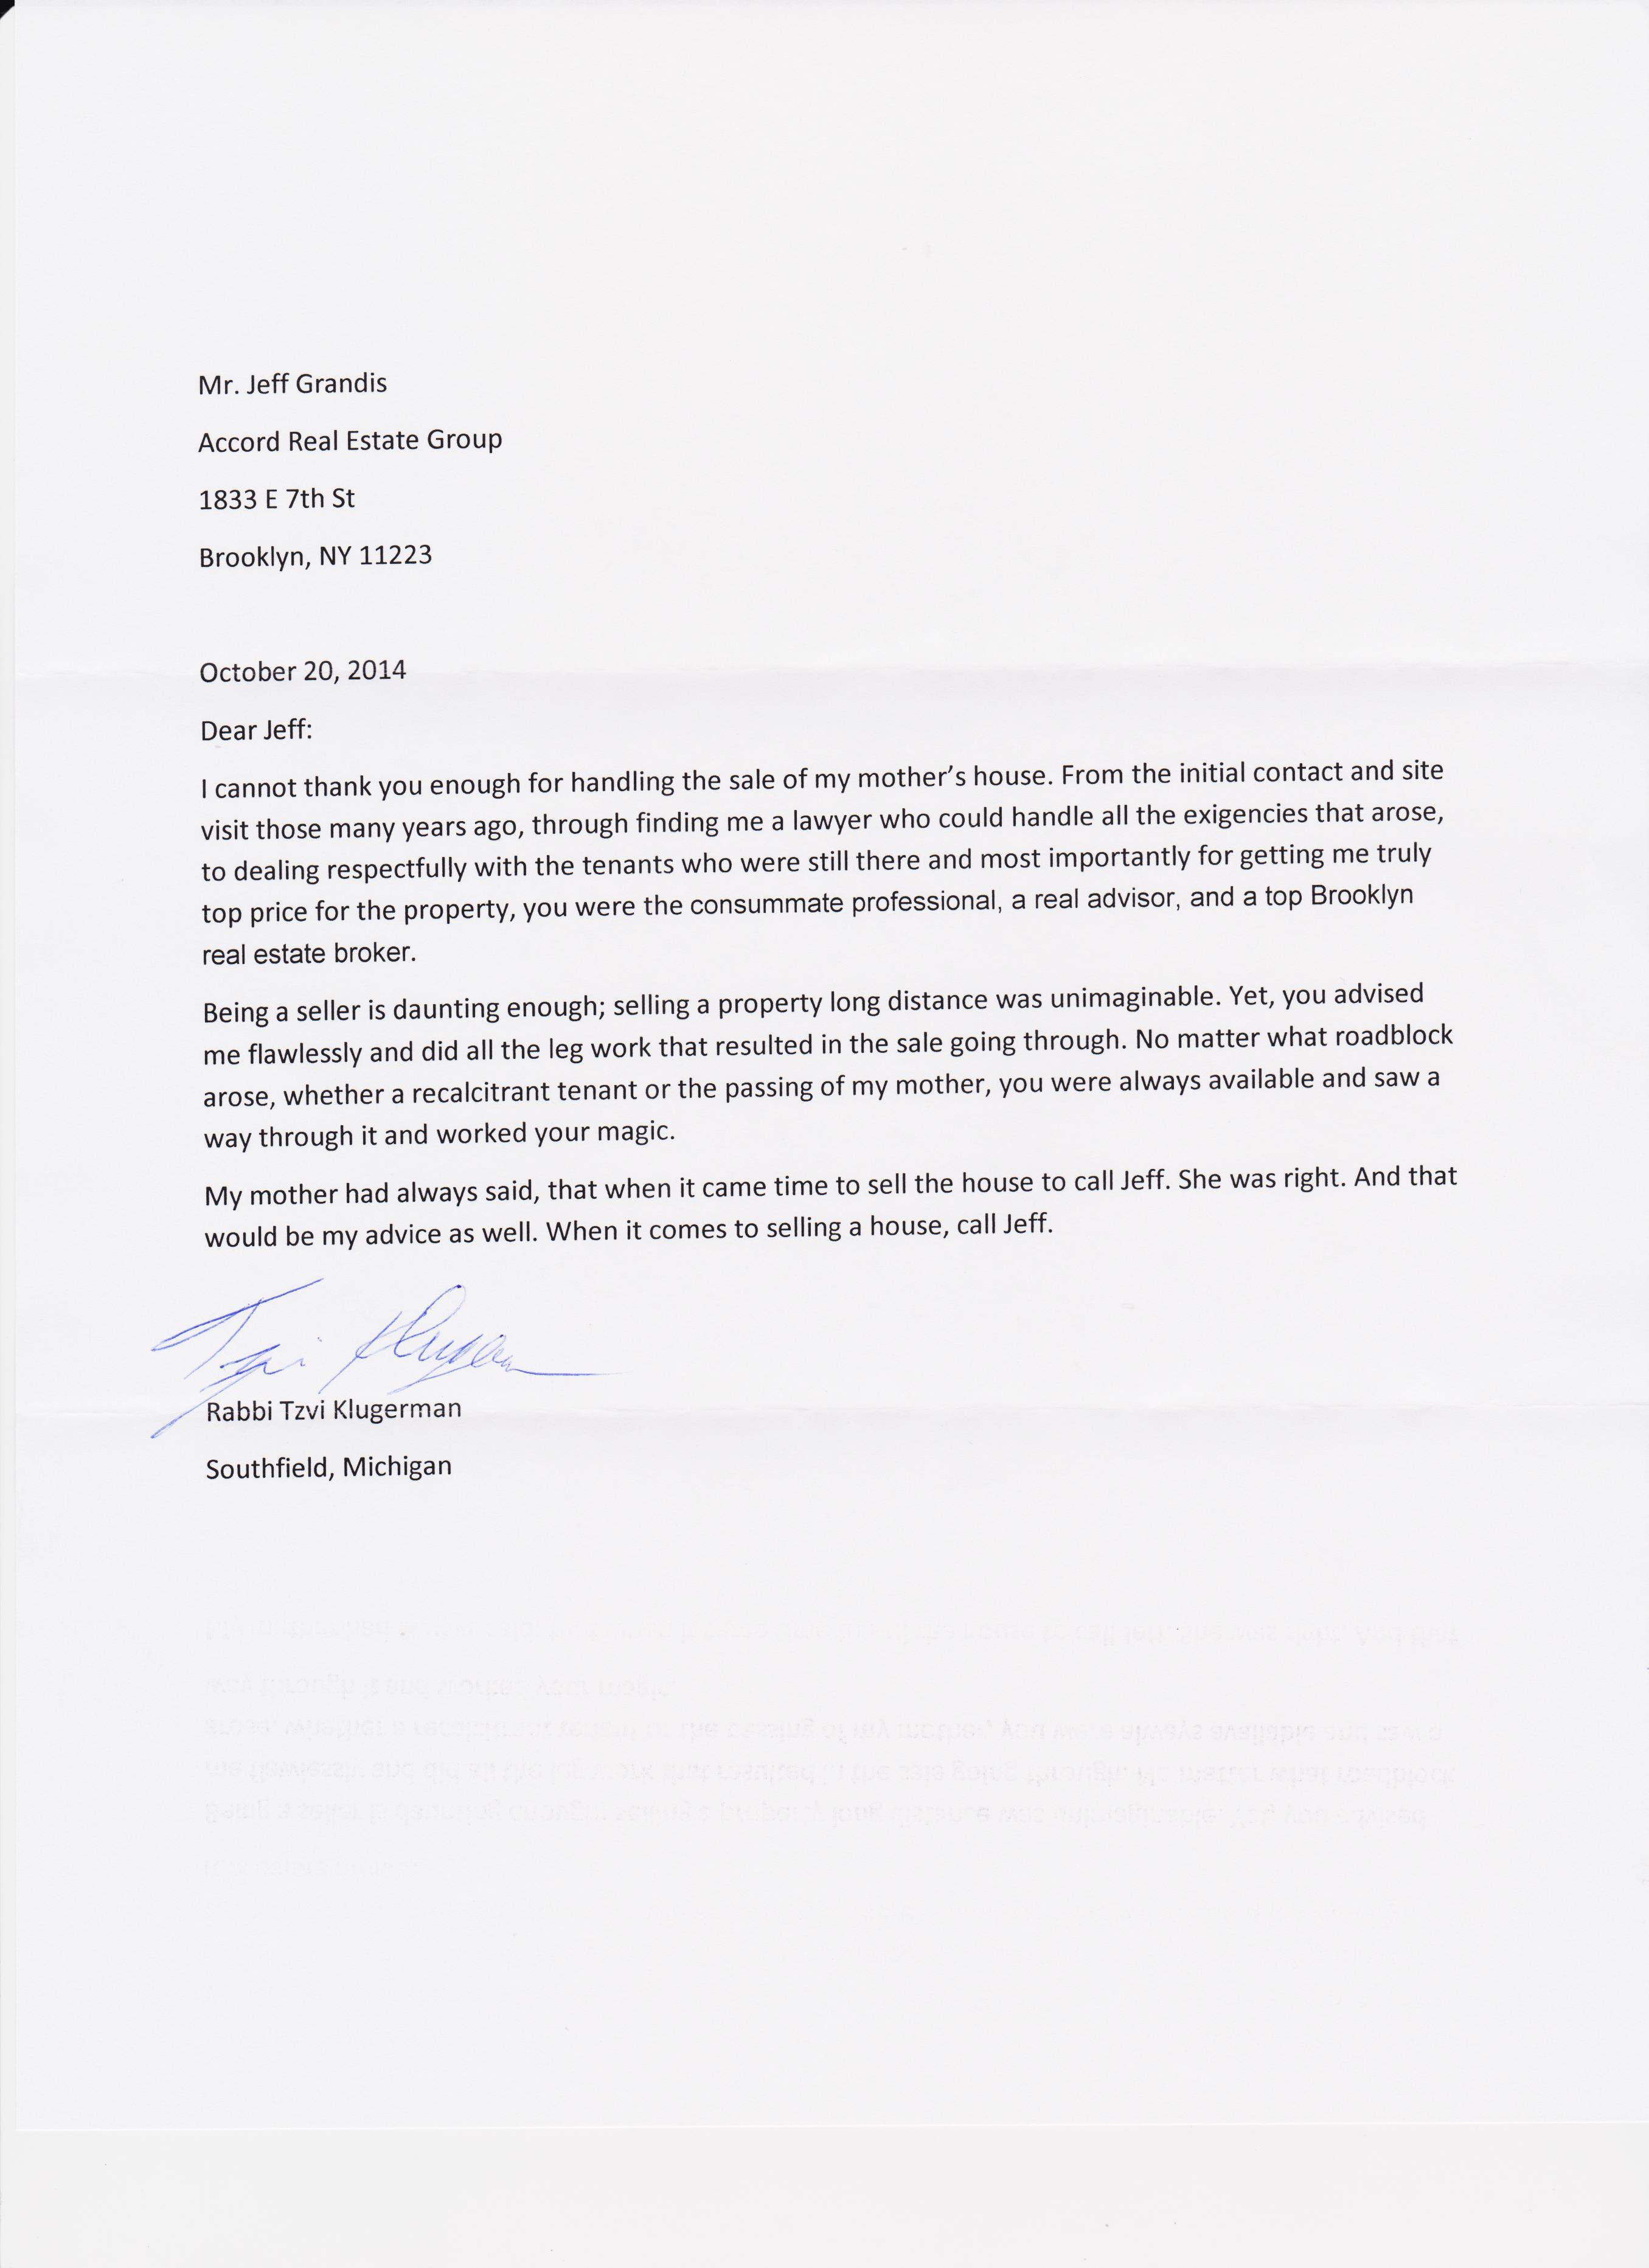 Letter From Rabbi Tzvi Klugerman